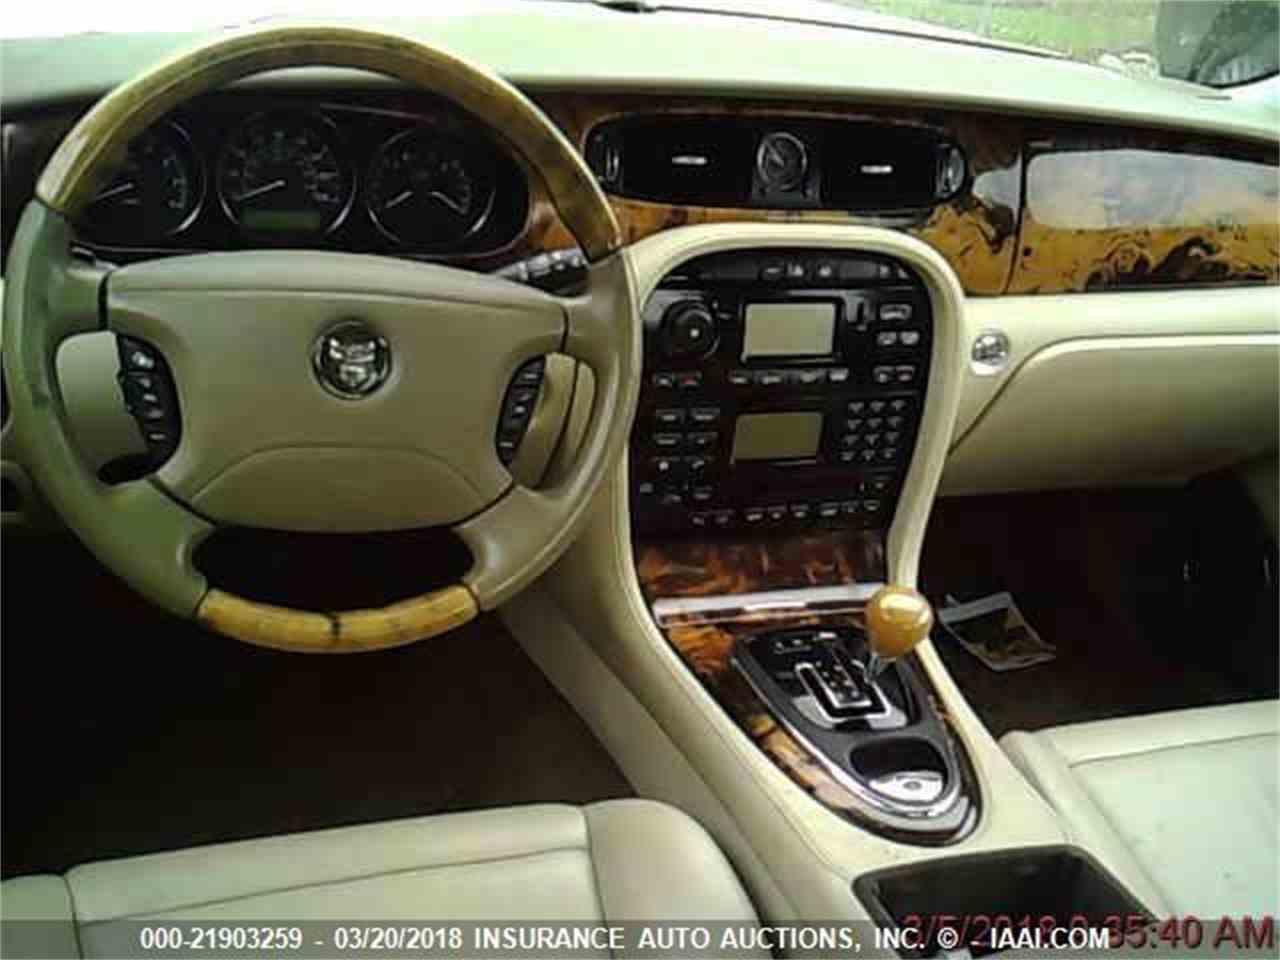 series dealership classic and jaguar l sale exotic main xj car for c htm